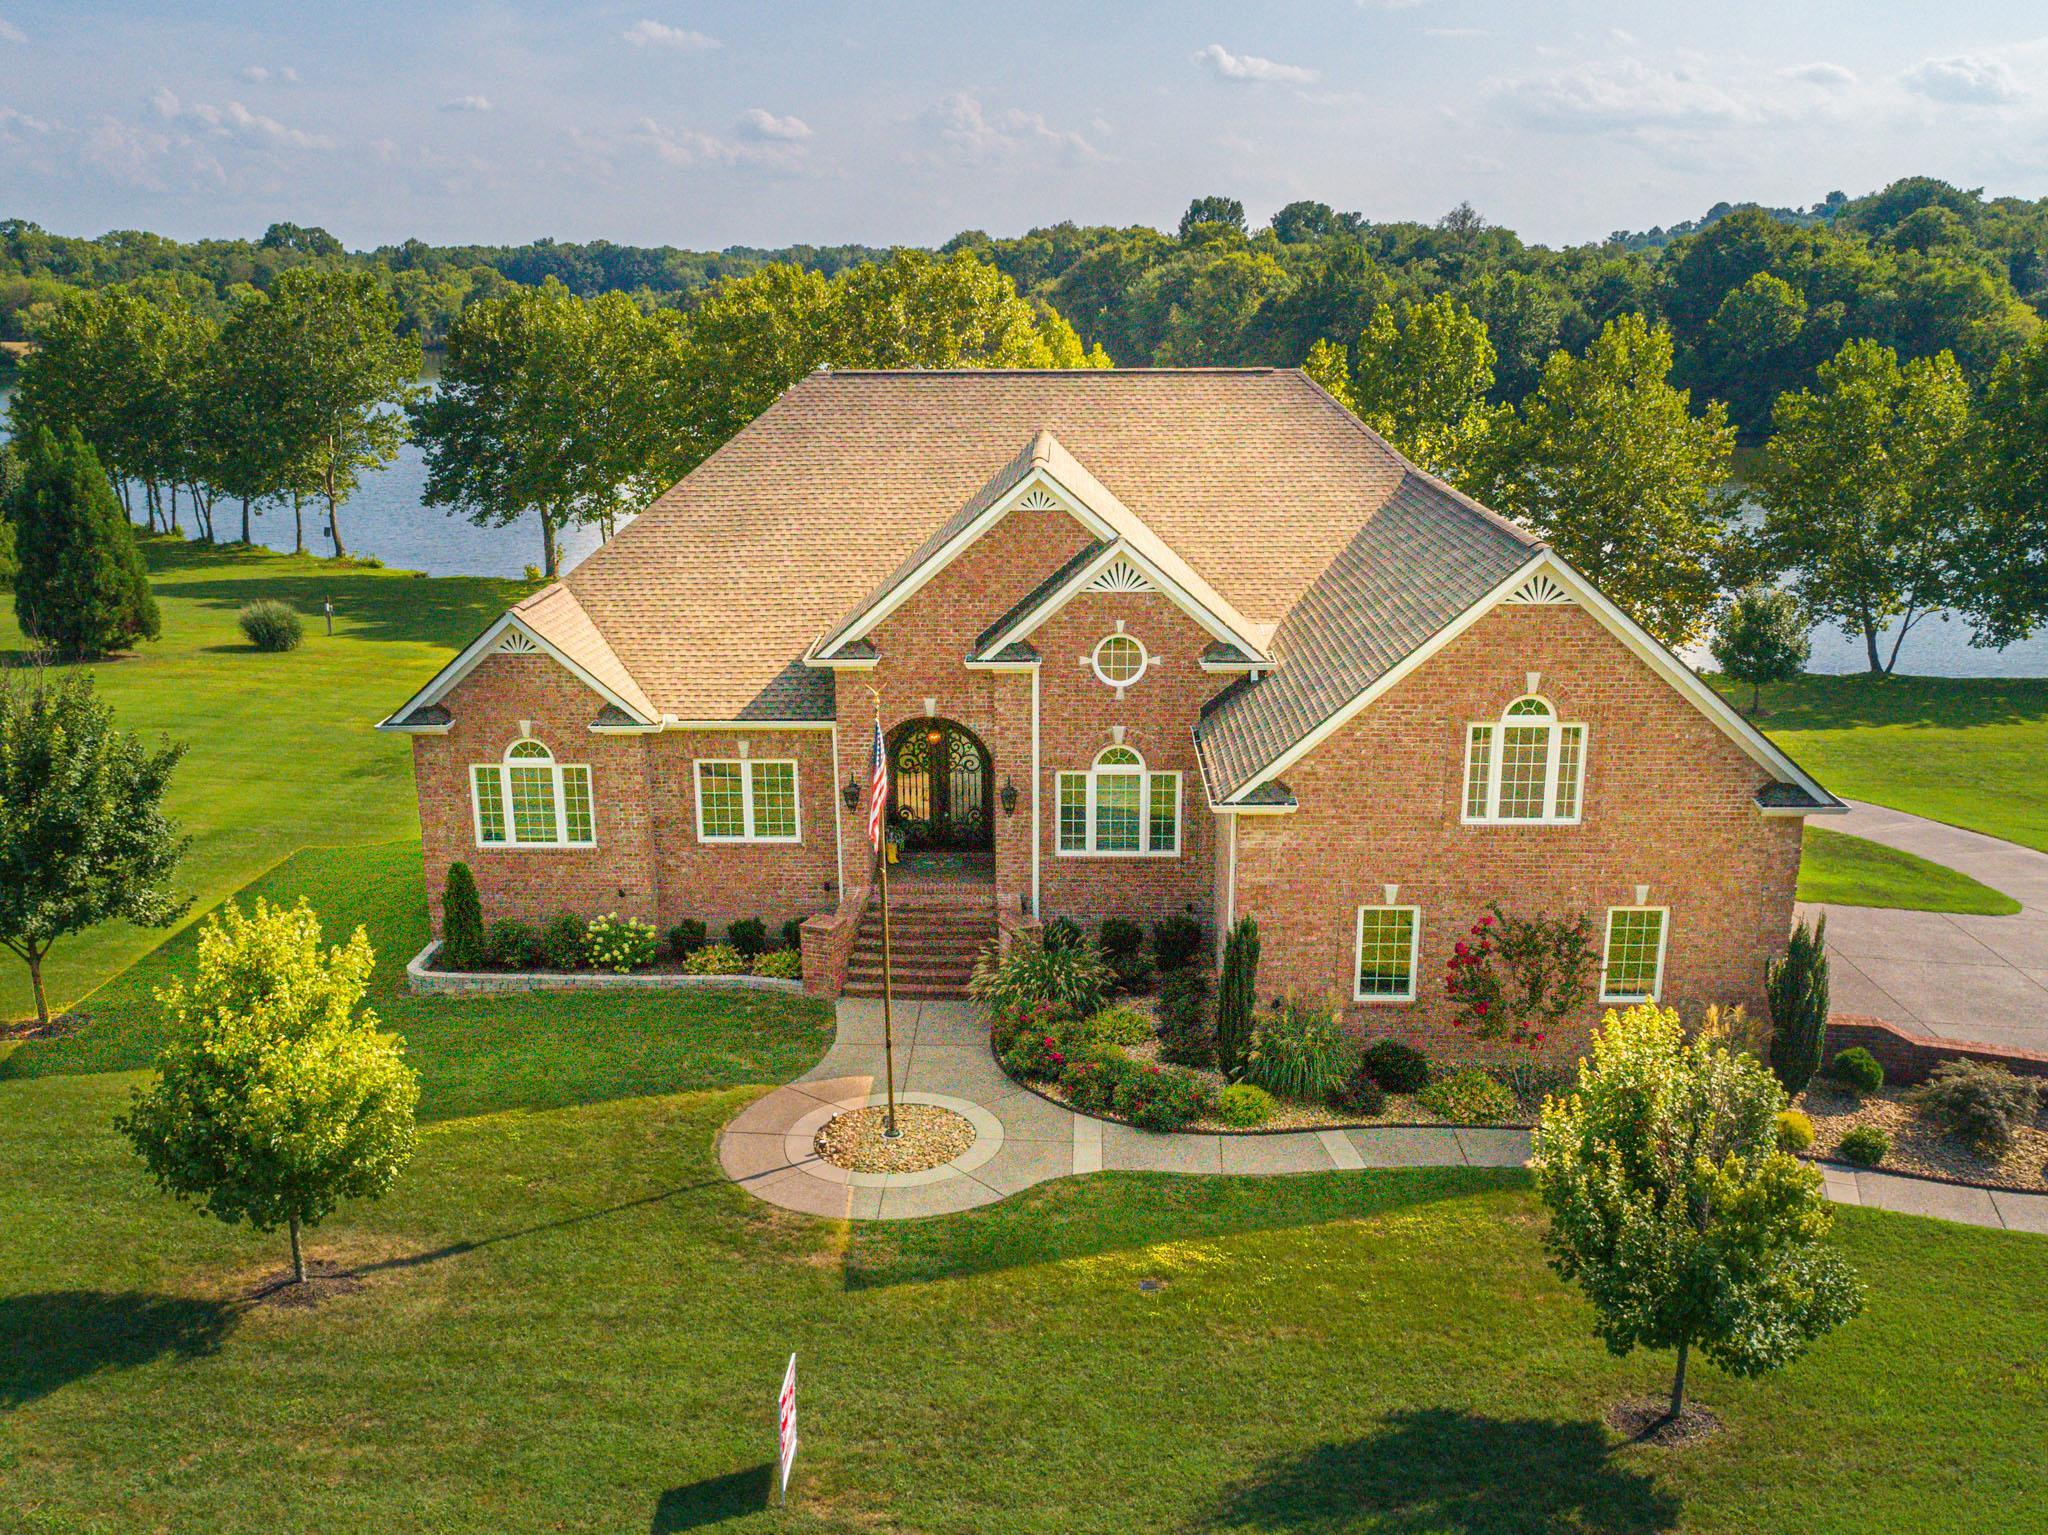 1000 Shimmering Way, Gallatin, TN 37066 - Gallatin, TN real estate listing